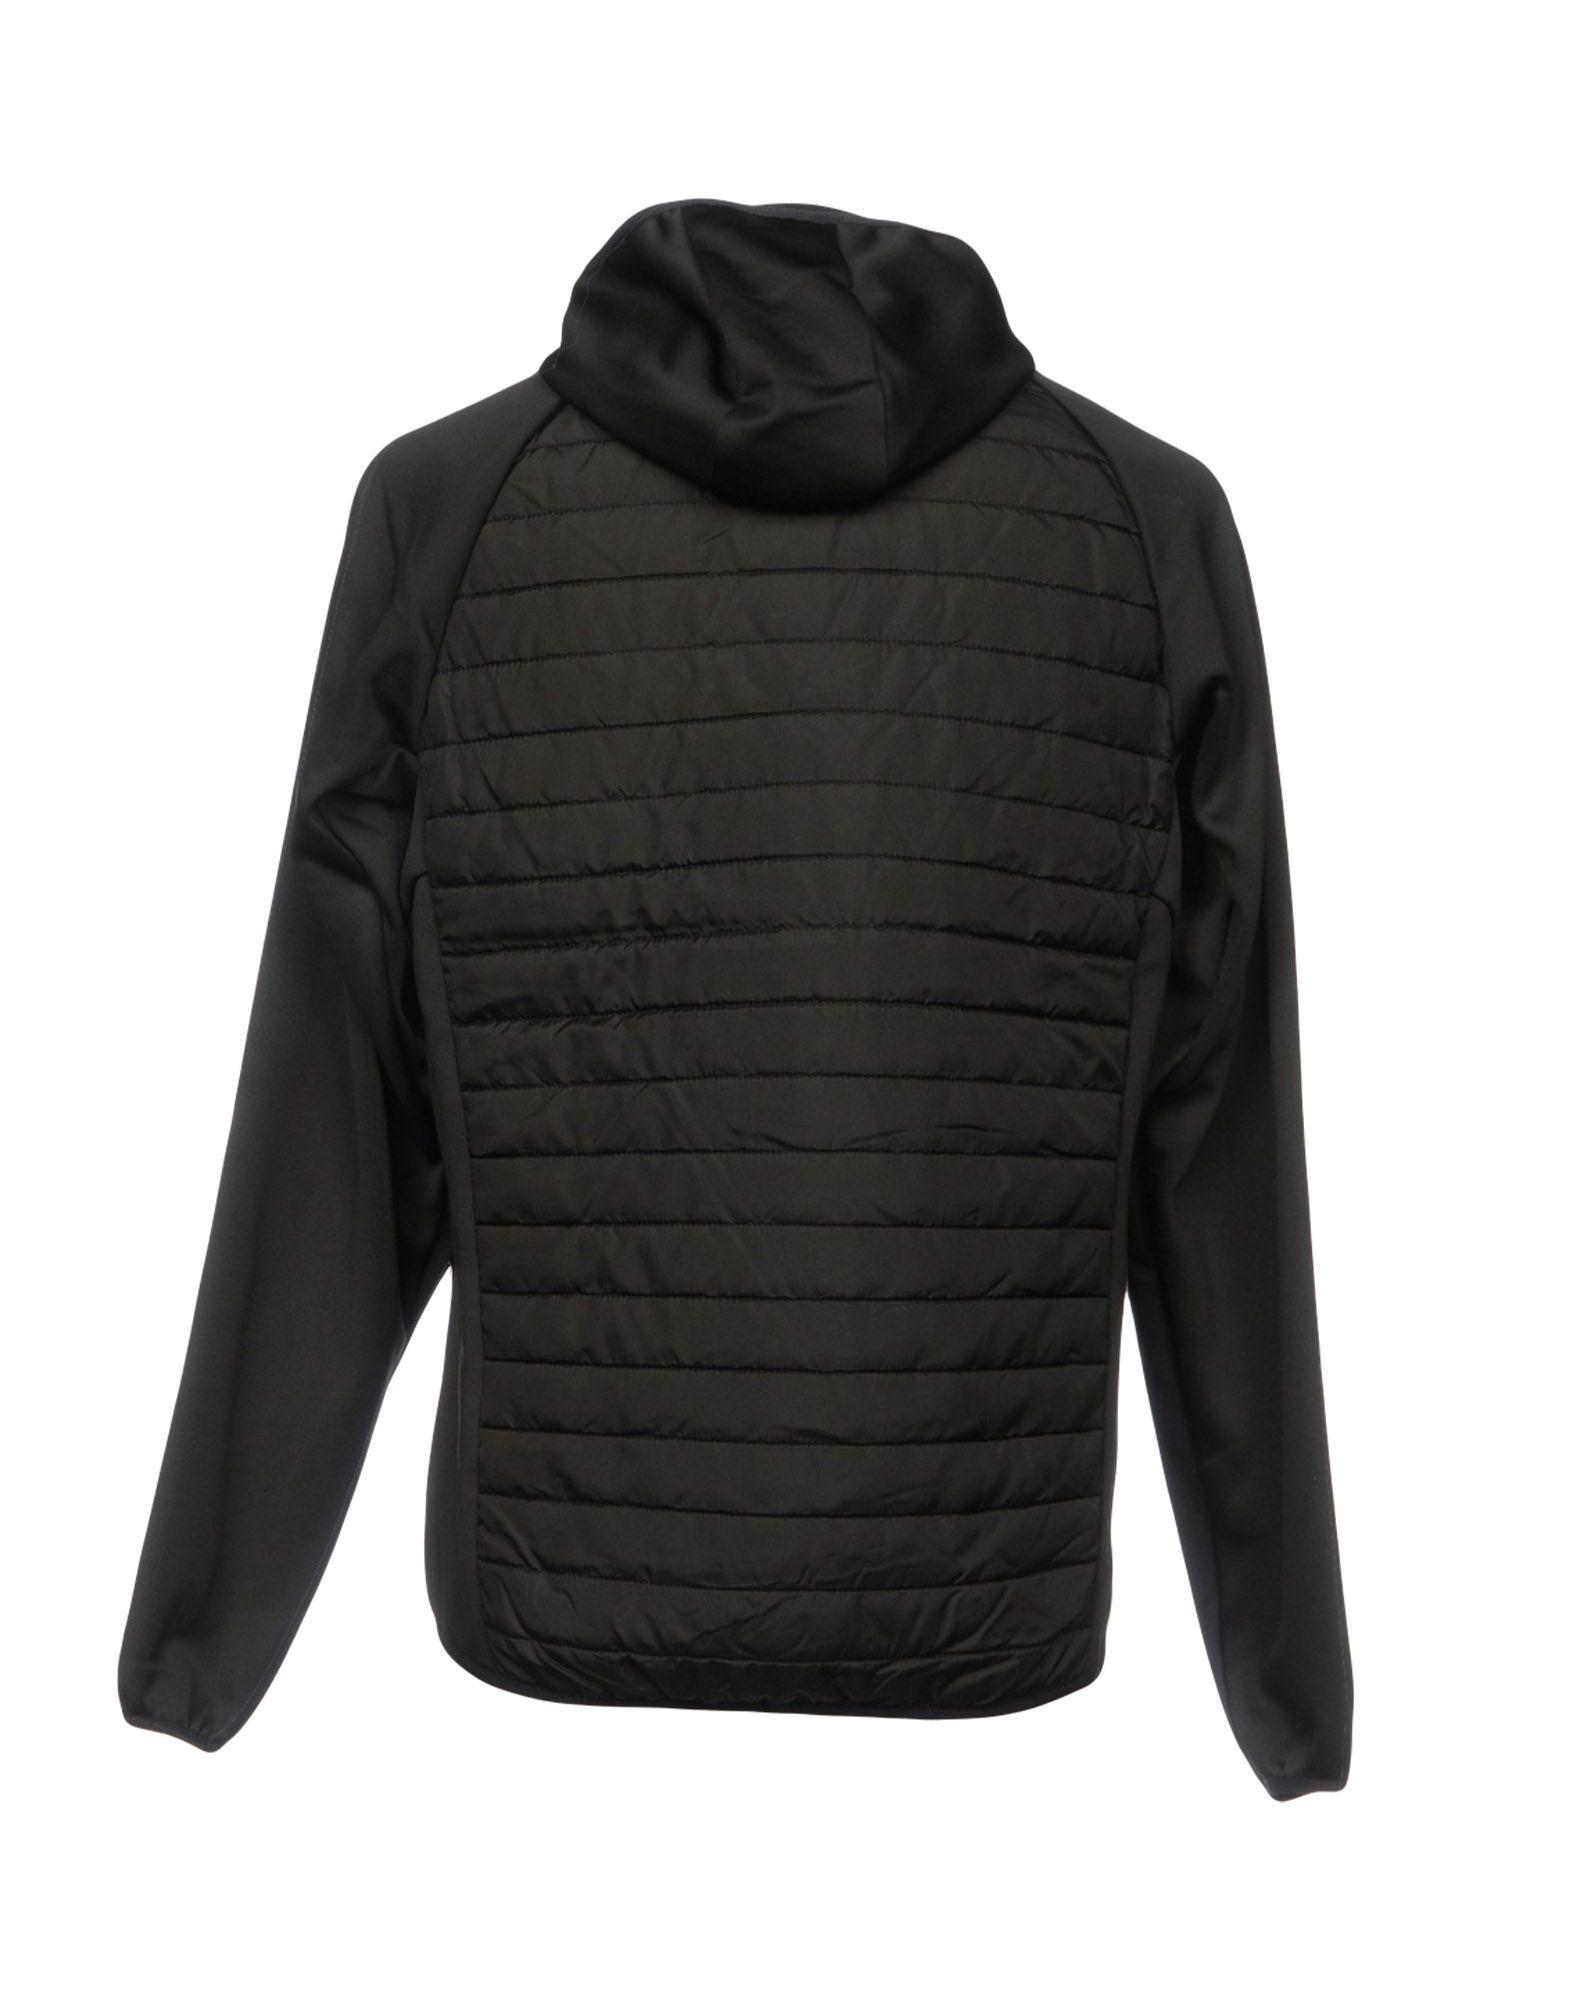 Jack & Jones Neoprene Jacket in Black for Men